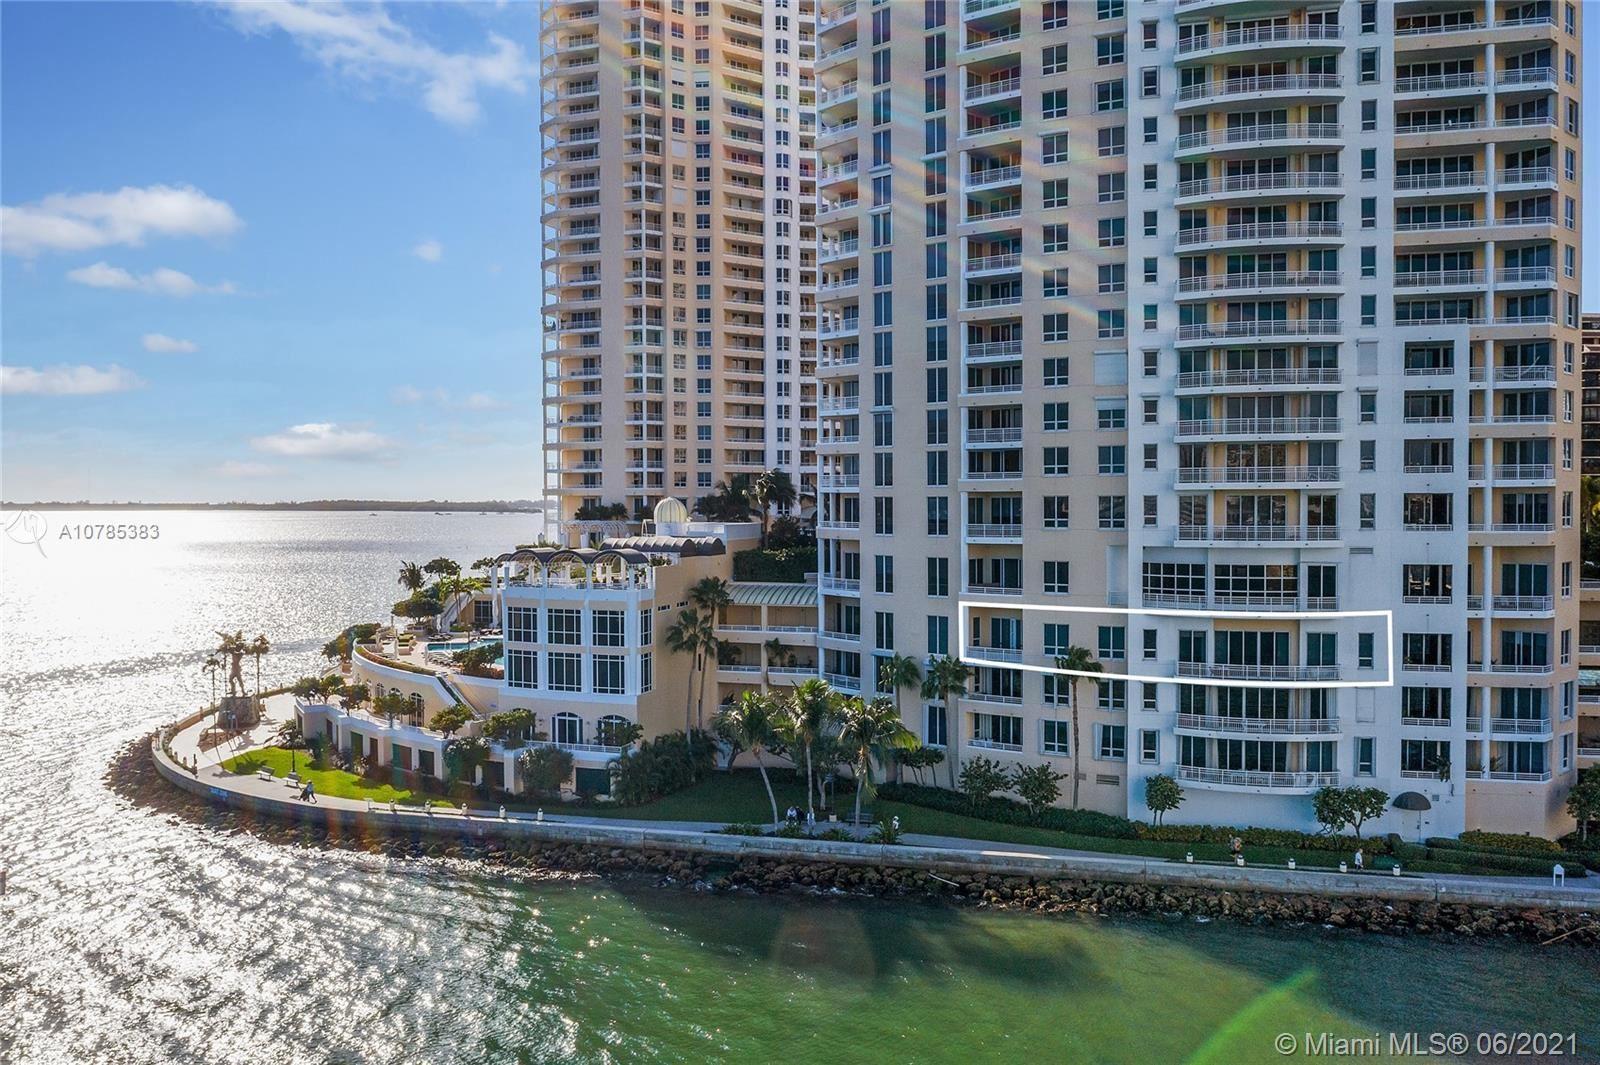 848 Brickell Key Dr #404, Miami, FL 33131 - #: A10785383